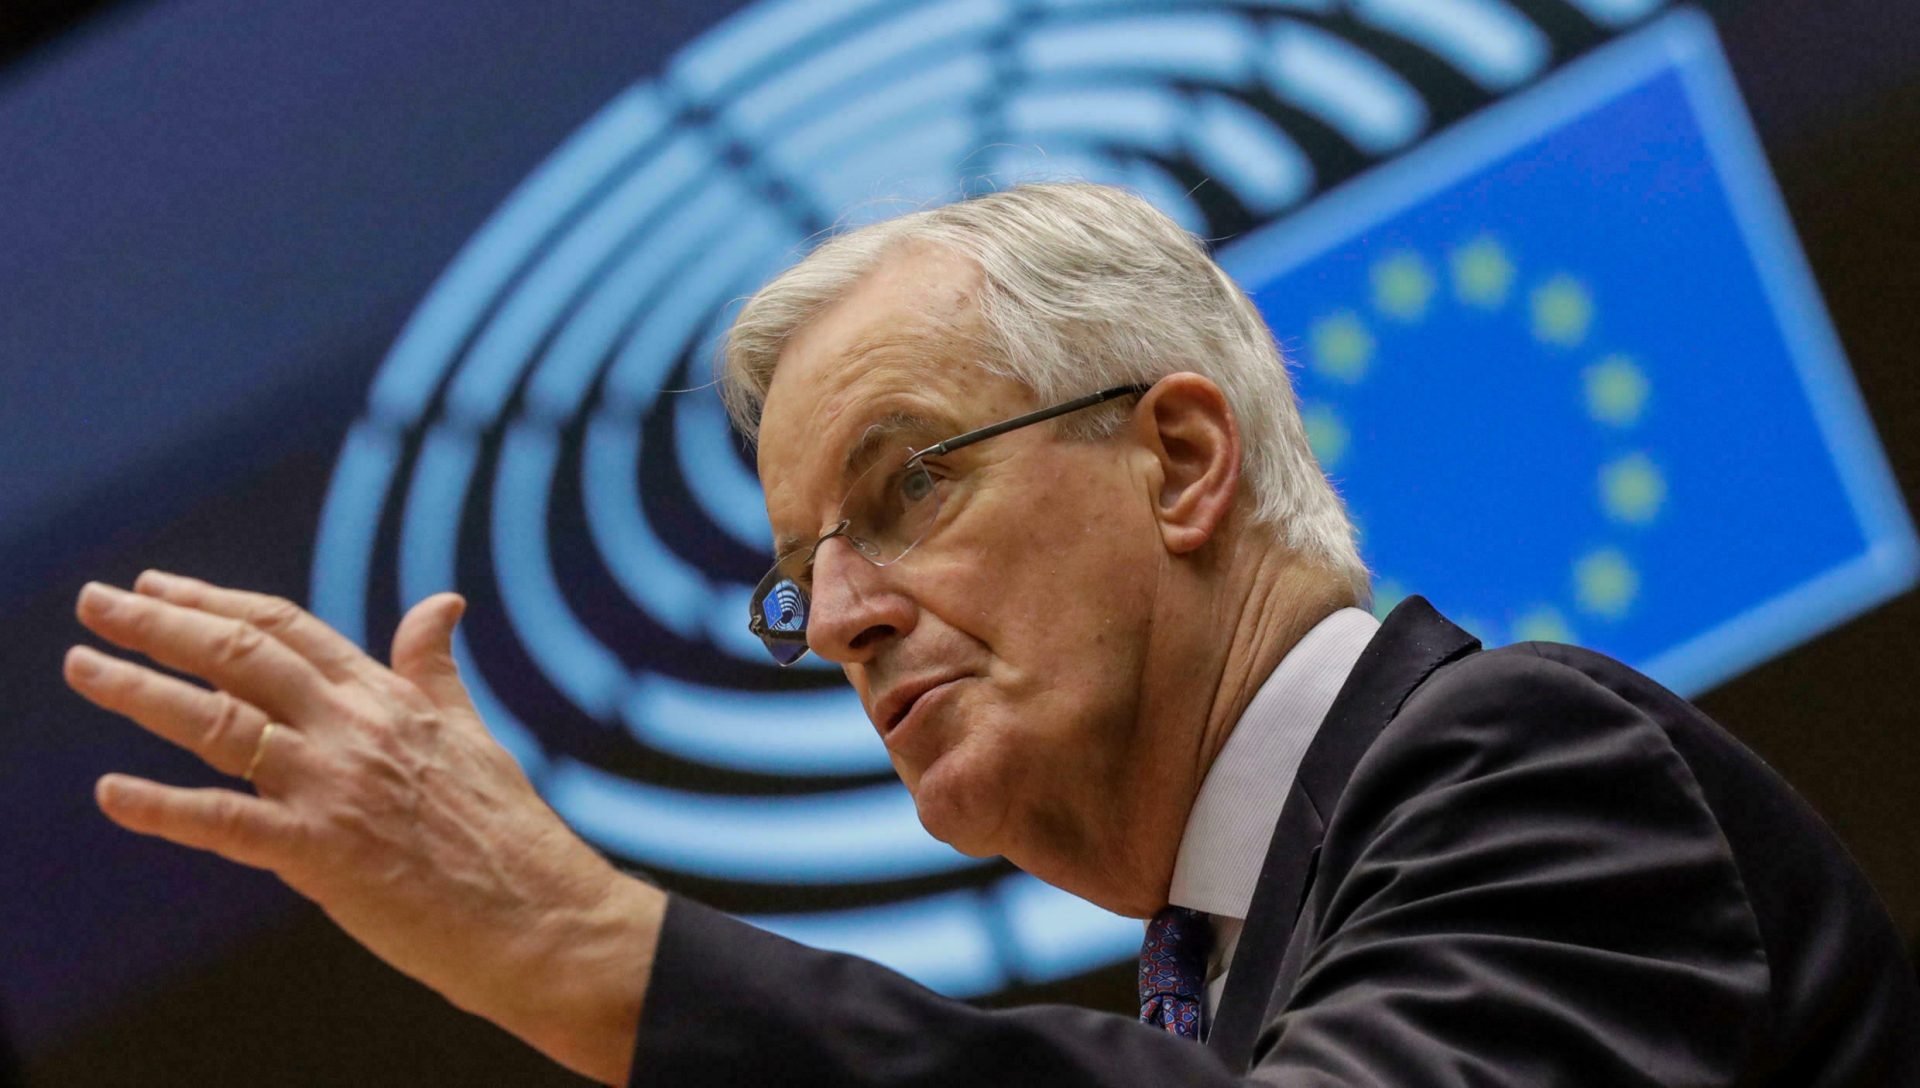 Primaire LR : c'est Barnier qui va baiser Bertrand et Pécresse…